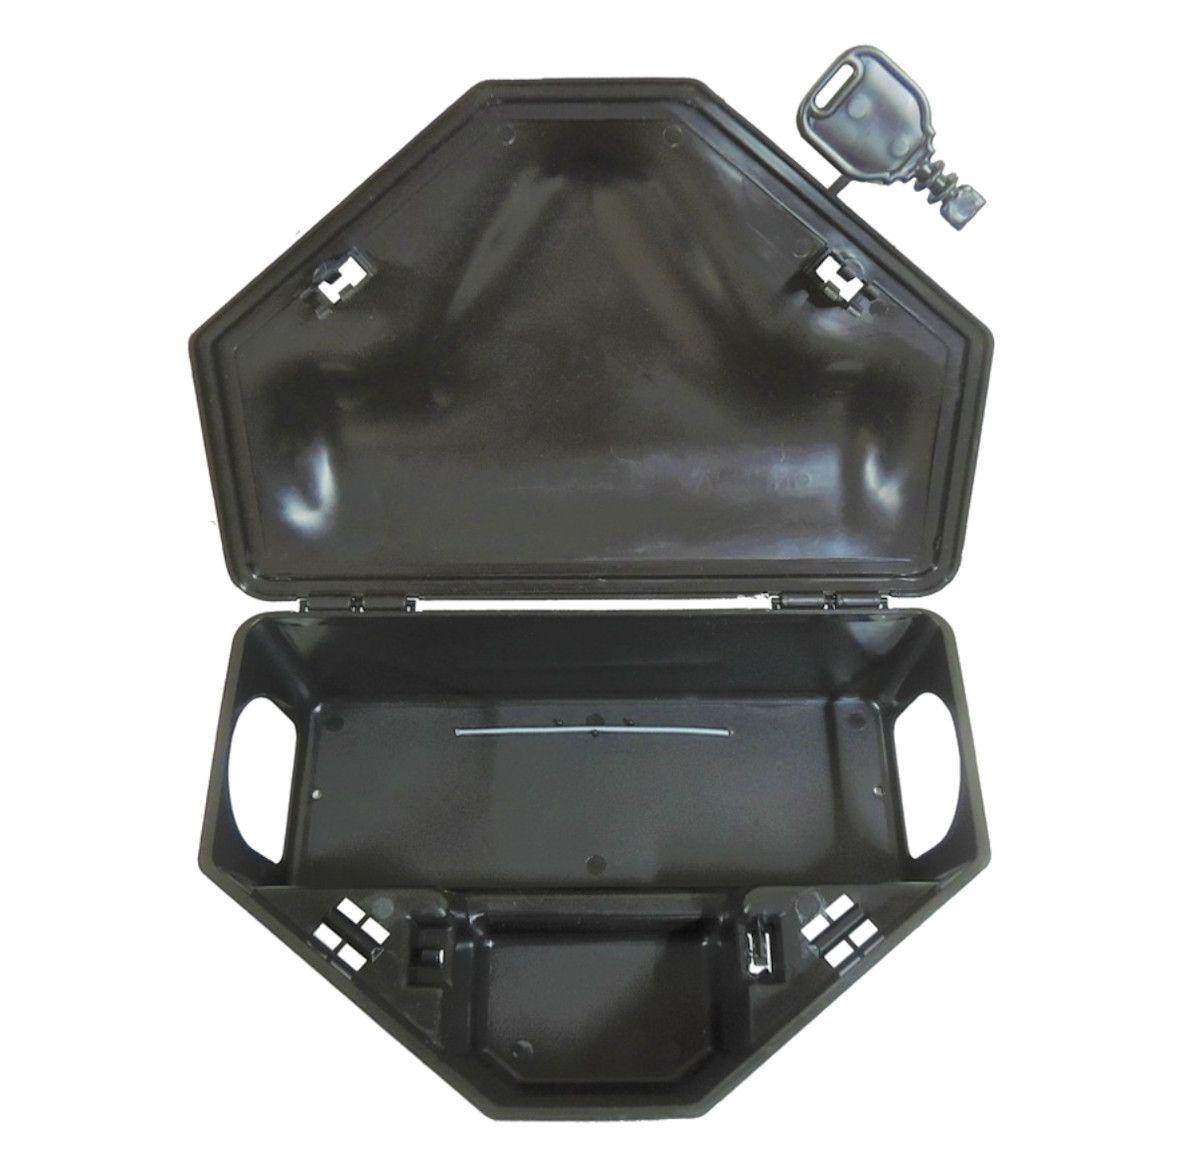 Kit 53 Porta Isca Com 2 Chaves - Duplo Travamento